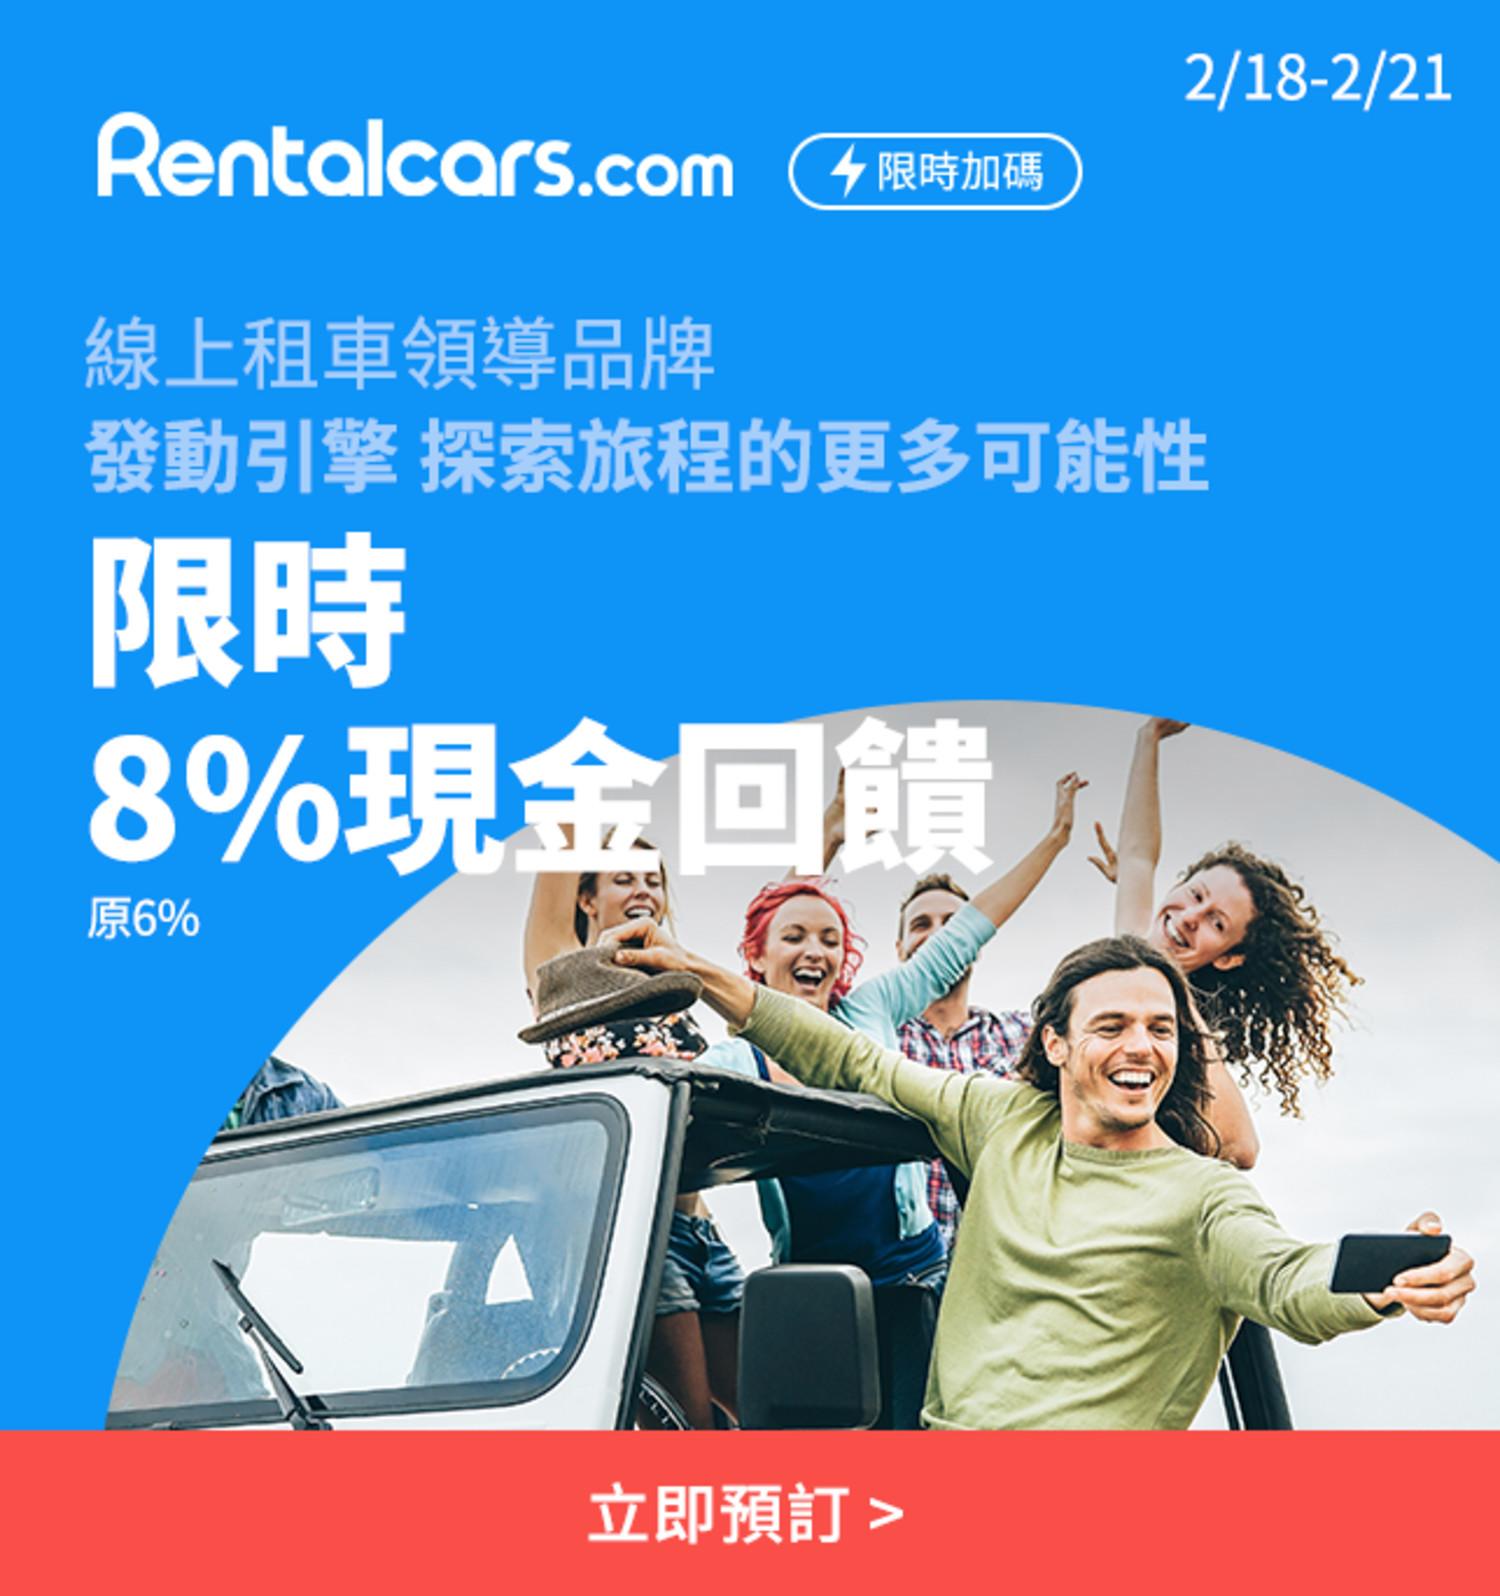 Rentalcars 2/18-2/21 限時8%